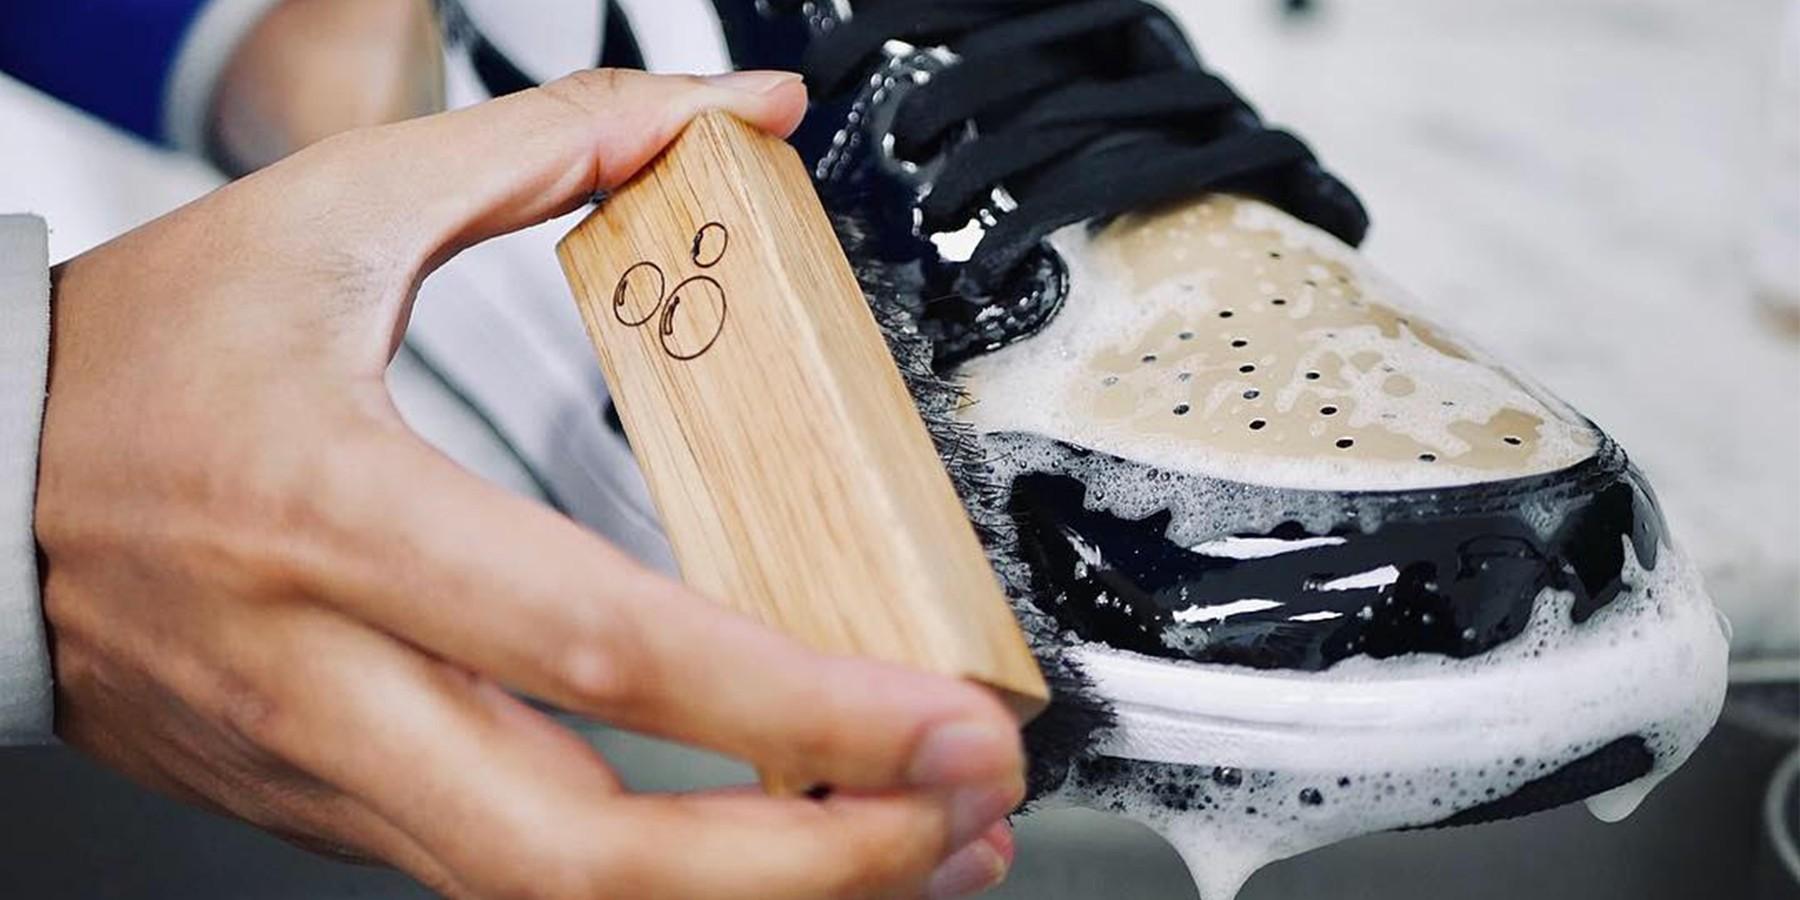 حفرة ريح شديدة مجرى Jak Prac Buty Zamszowe Nike Natural Soap Directory Org